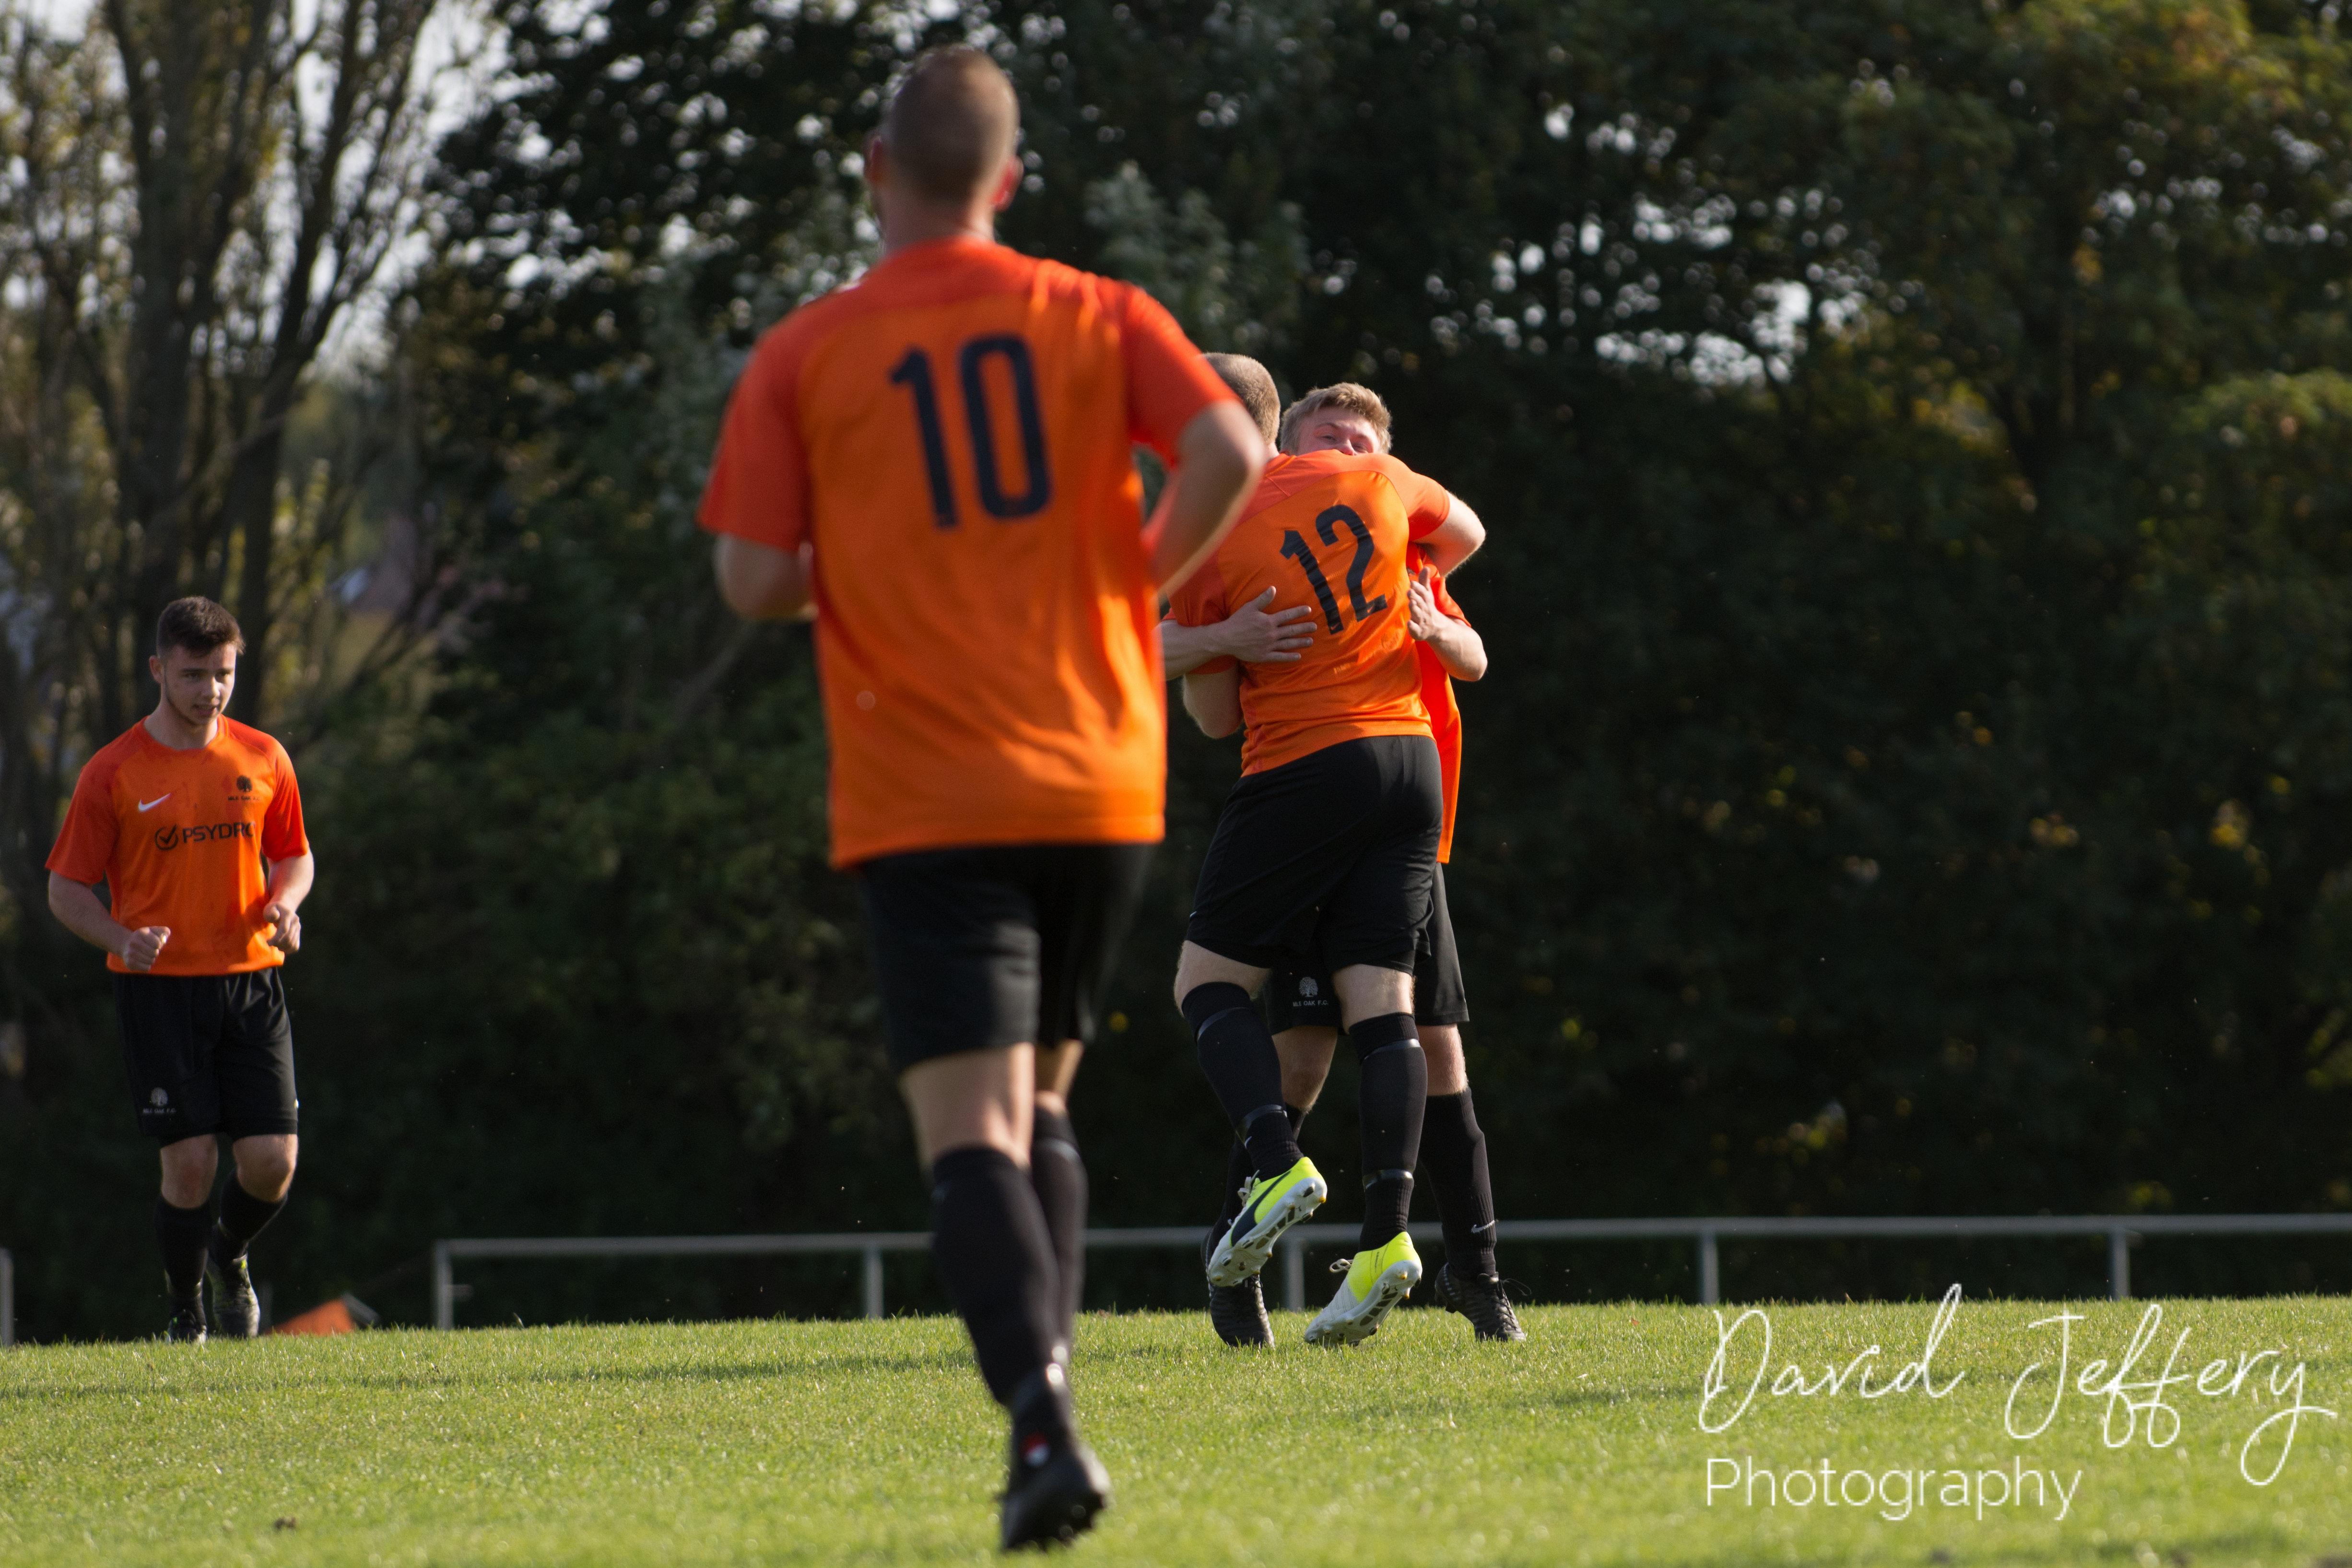 DAVID_JEFFERY MOFC vs M'Hurst 29.09